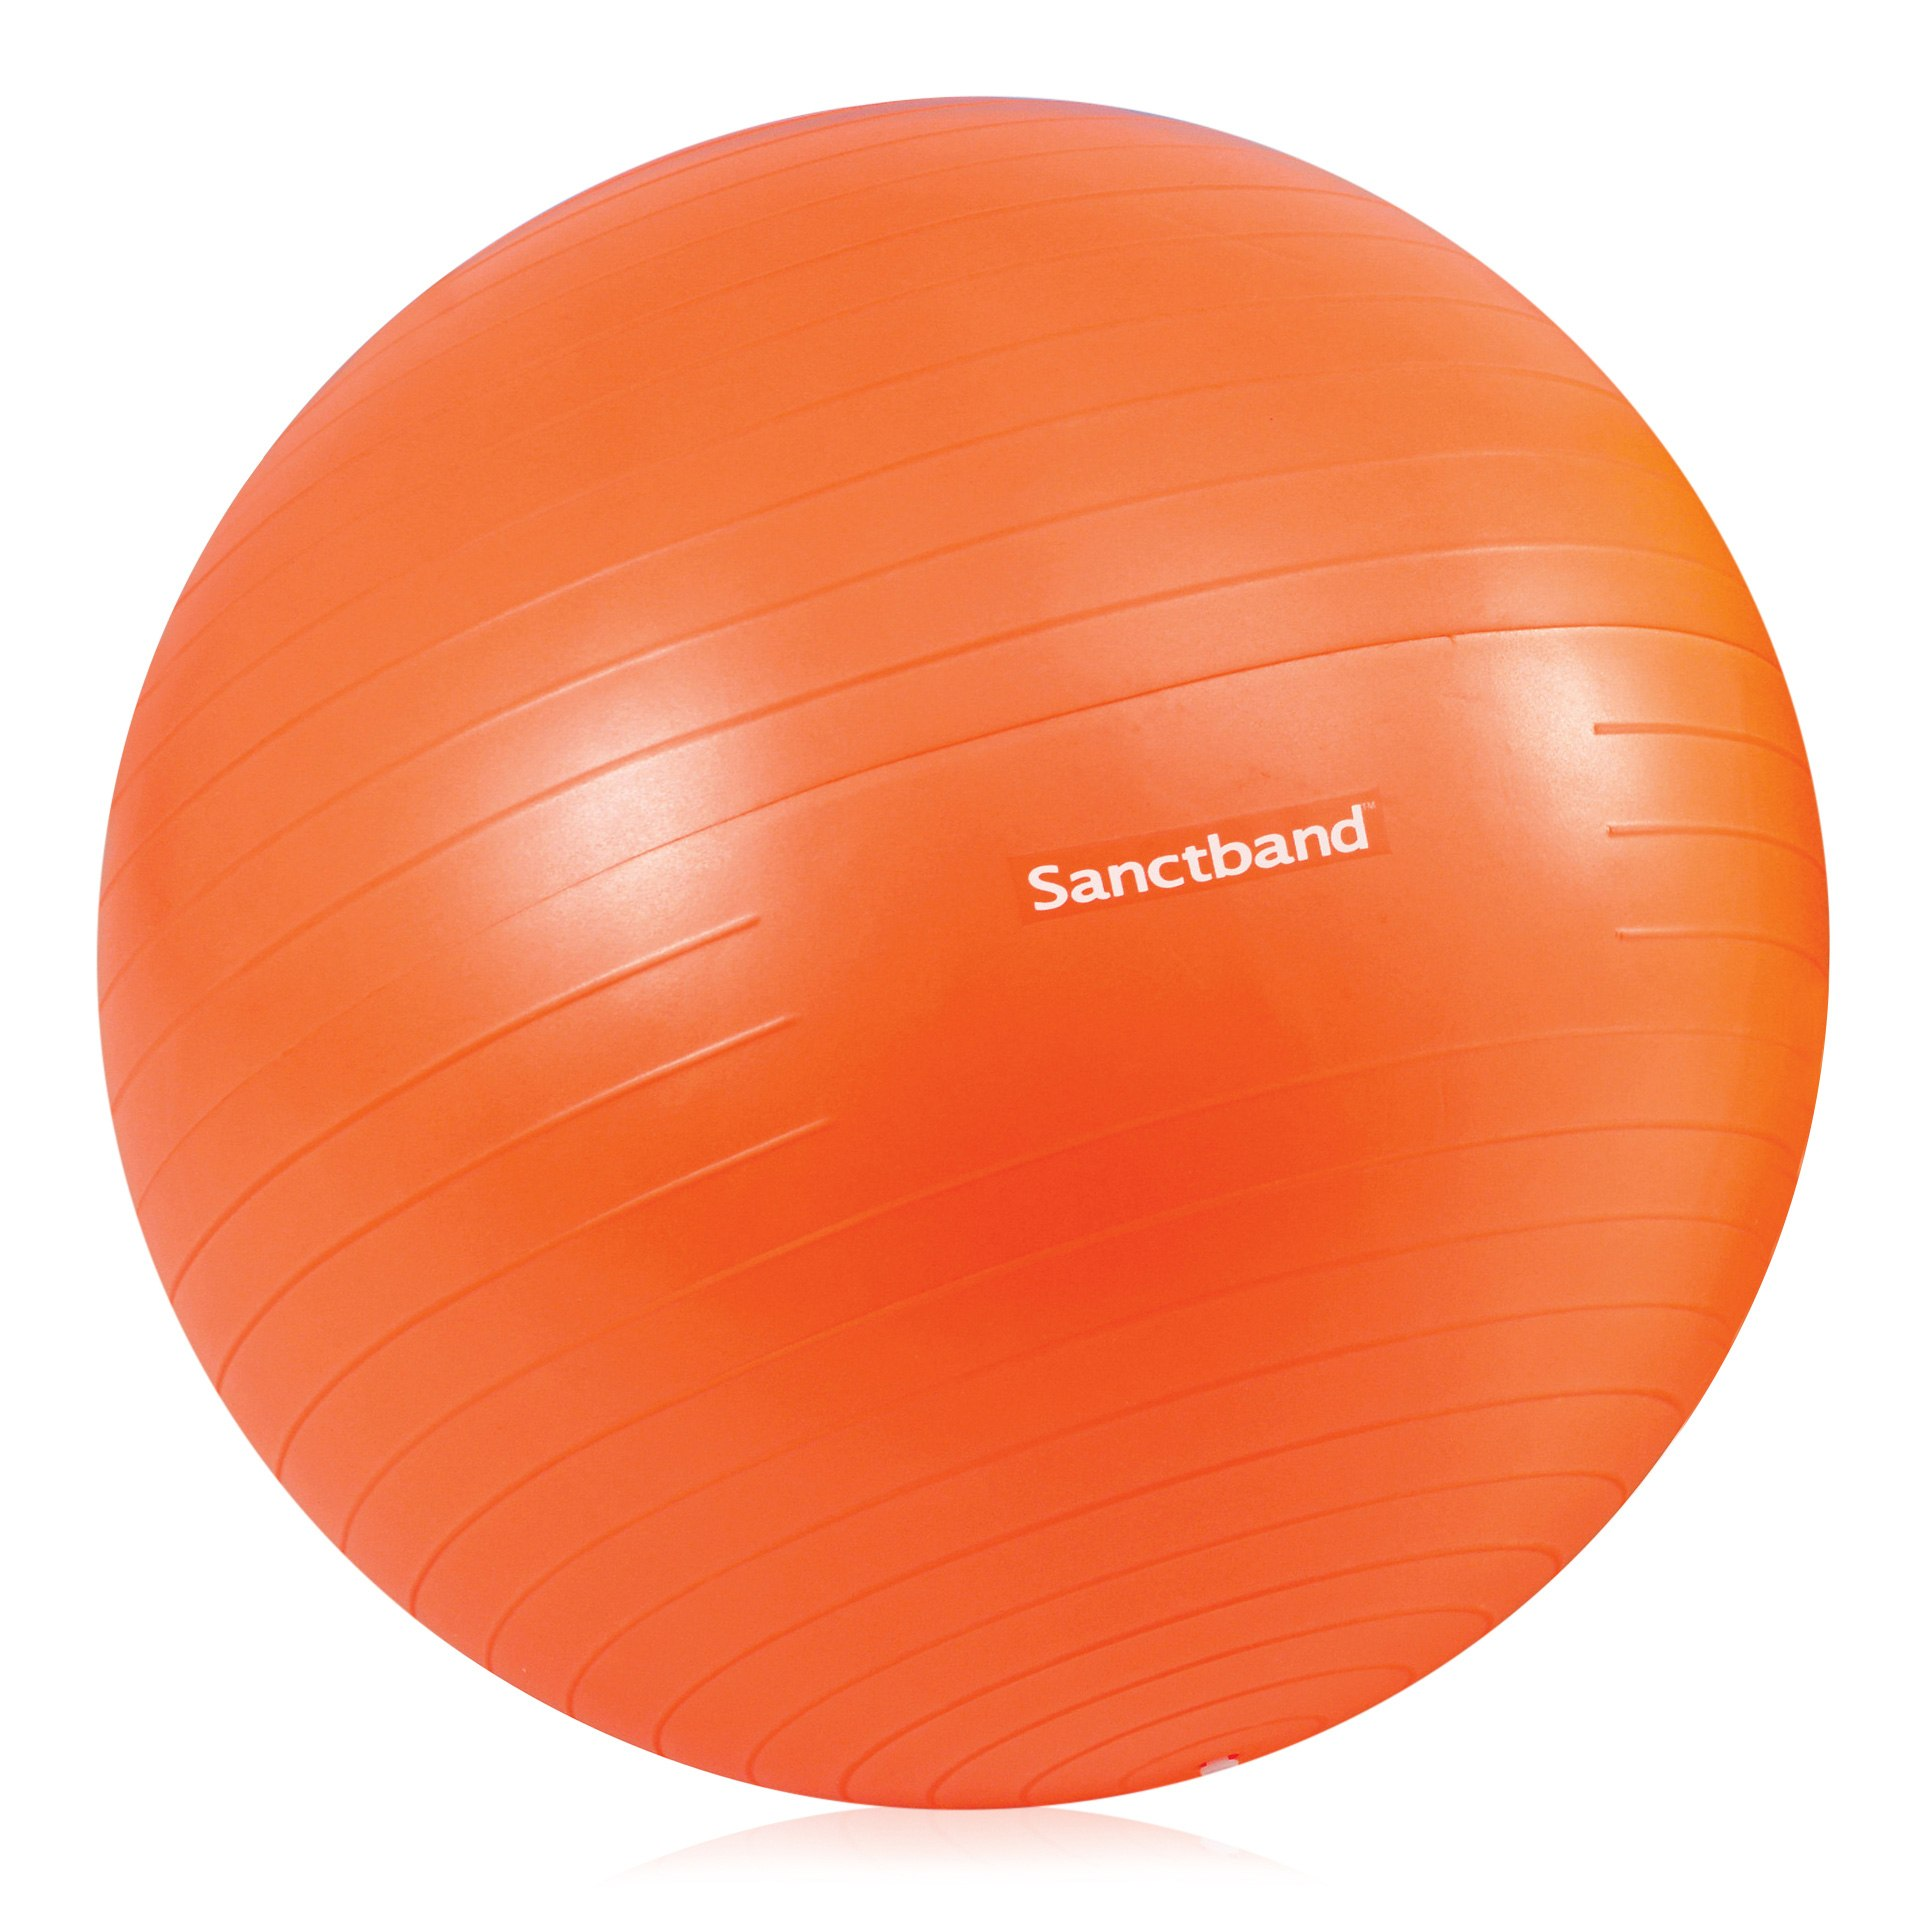 Sanctband Anti Burst Gymnastikball Orange 55cm Durchmesser